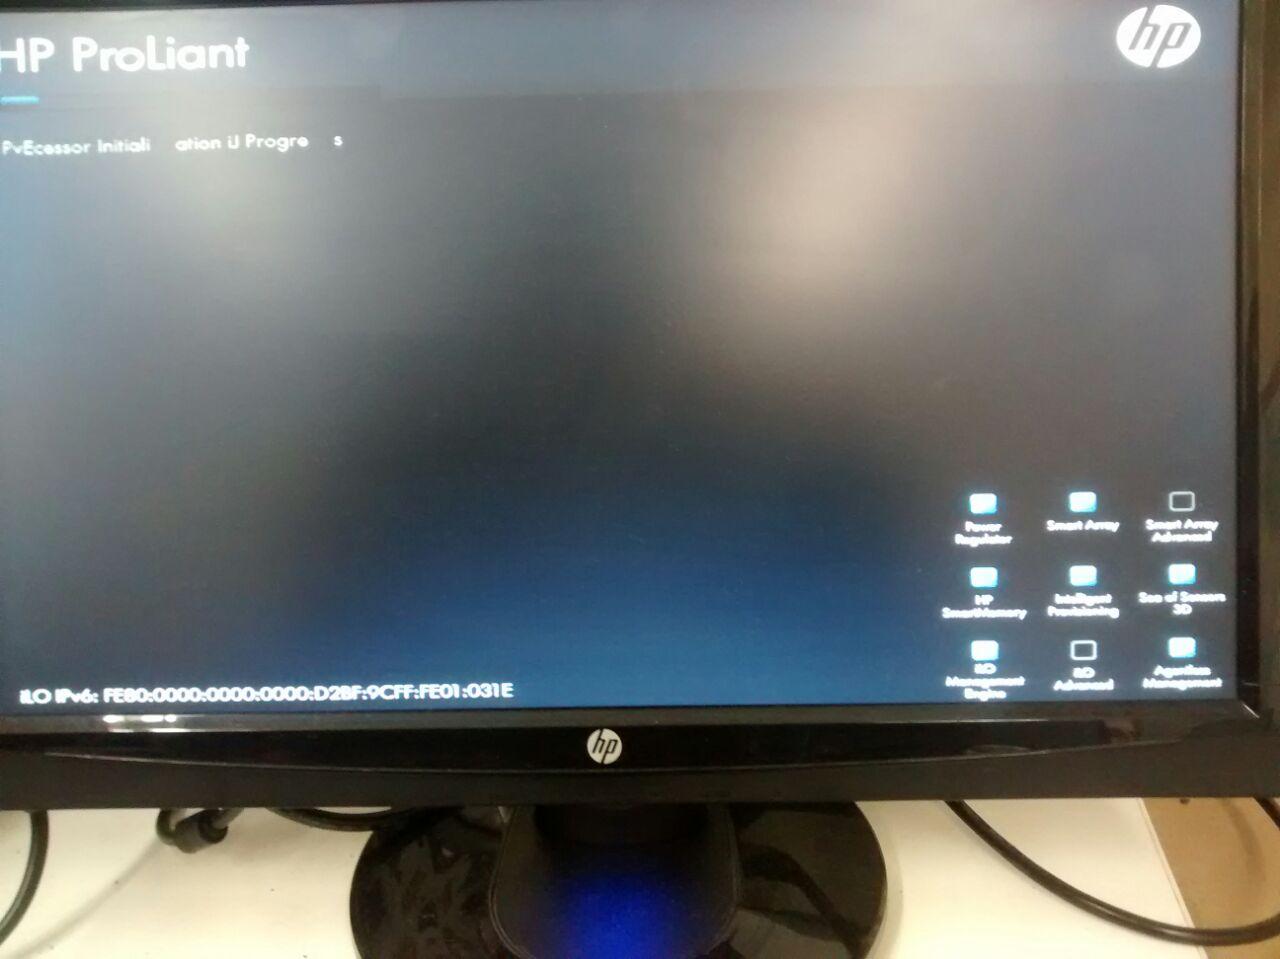 servidor bz67.jpg